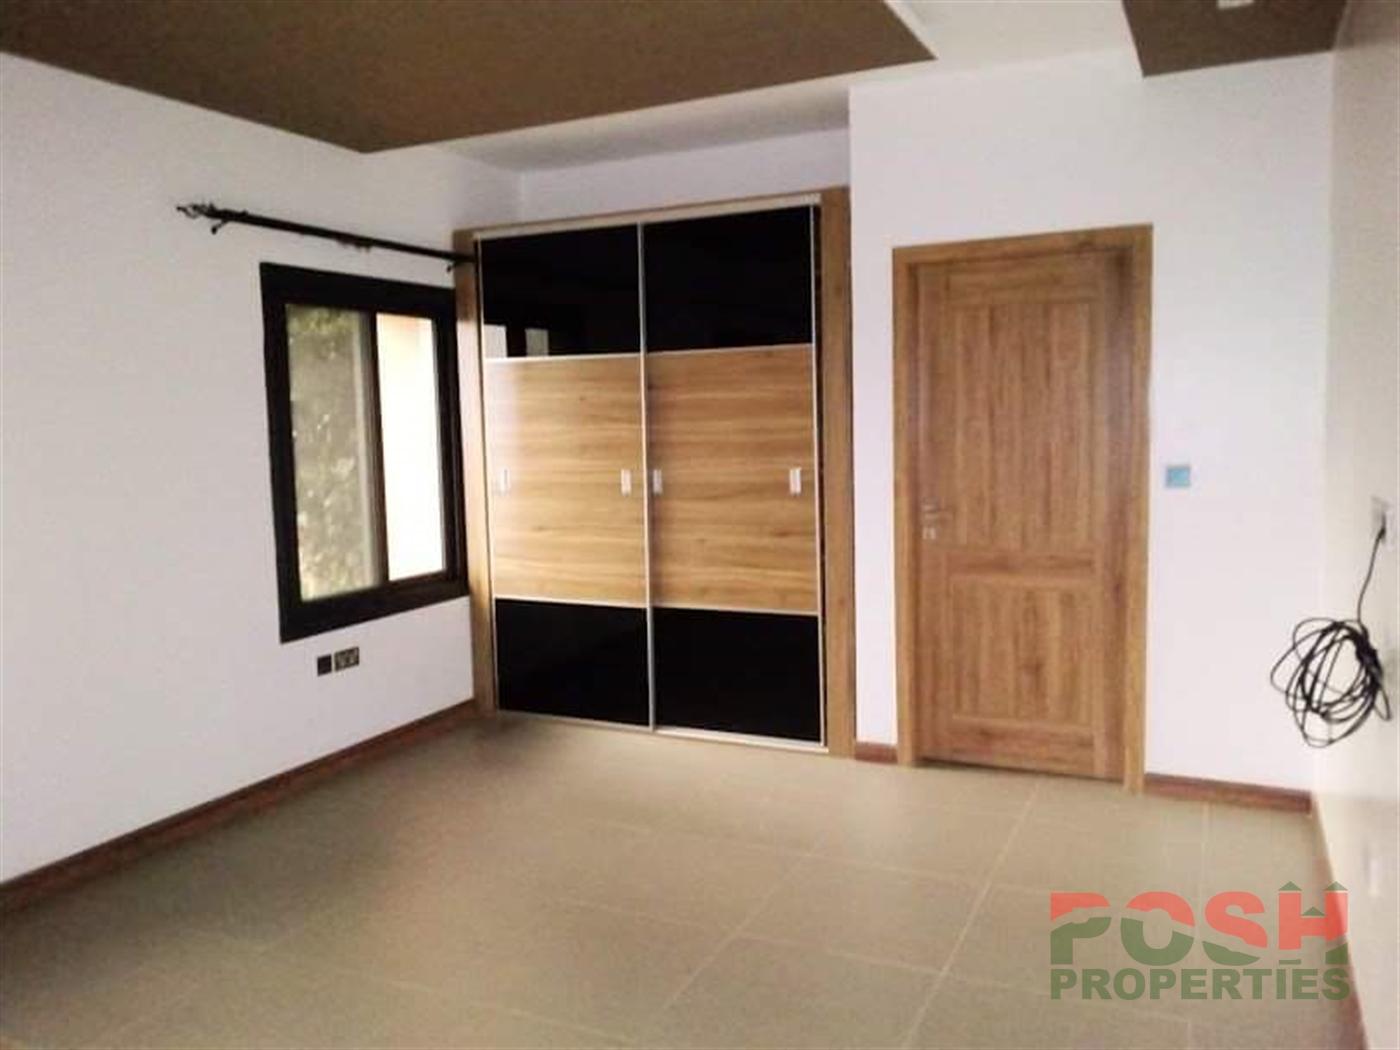 Town House for rent in Munyonyo Kampala